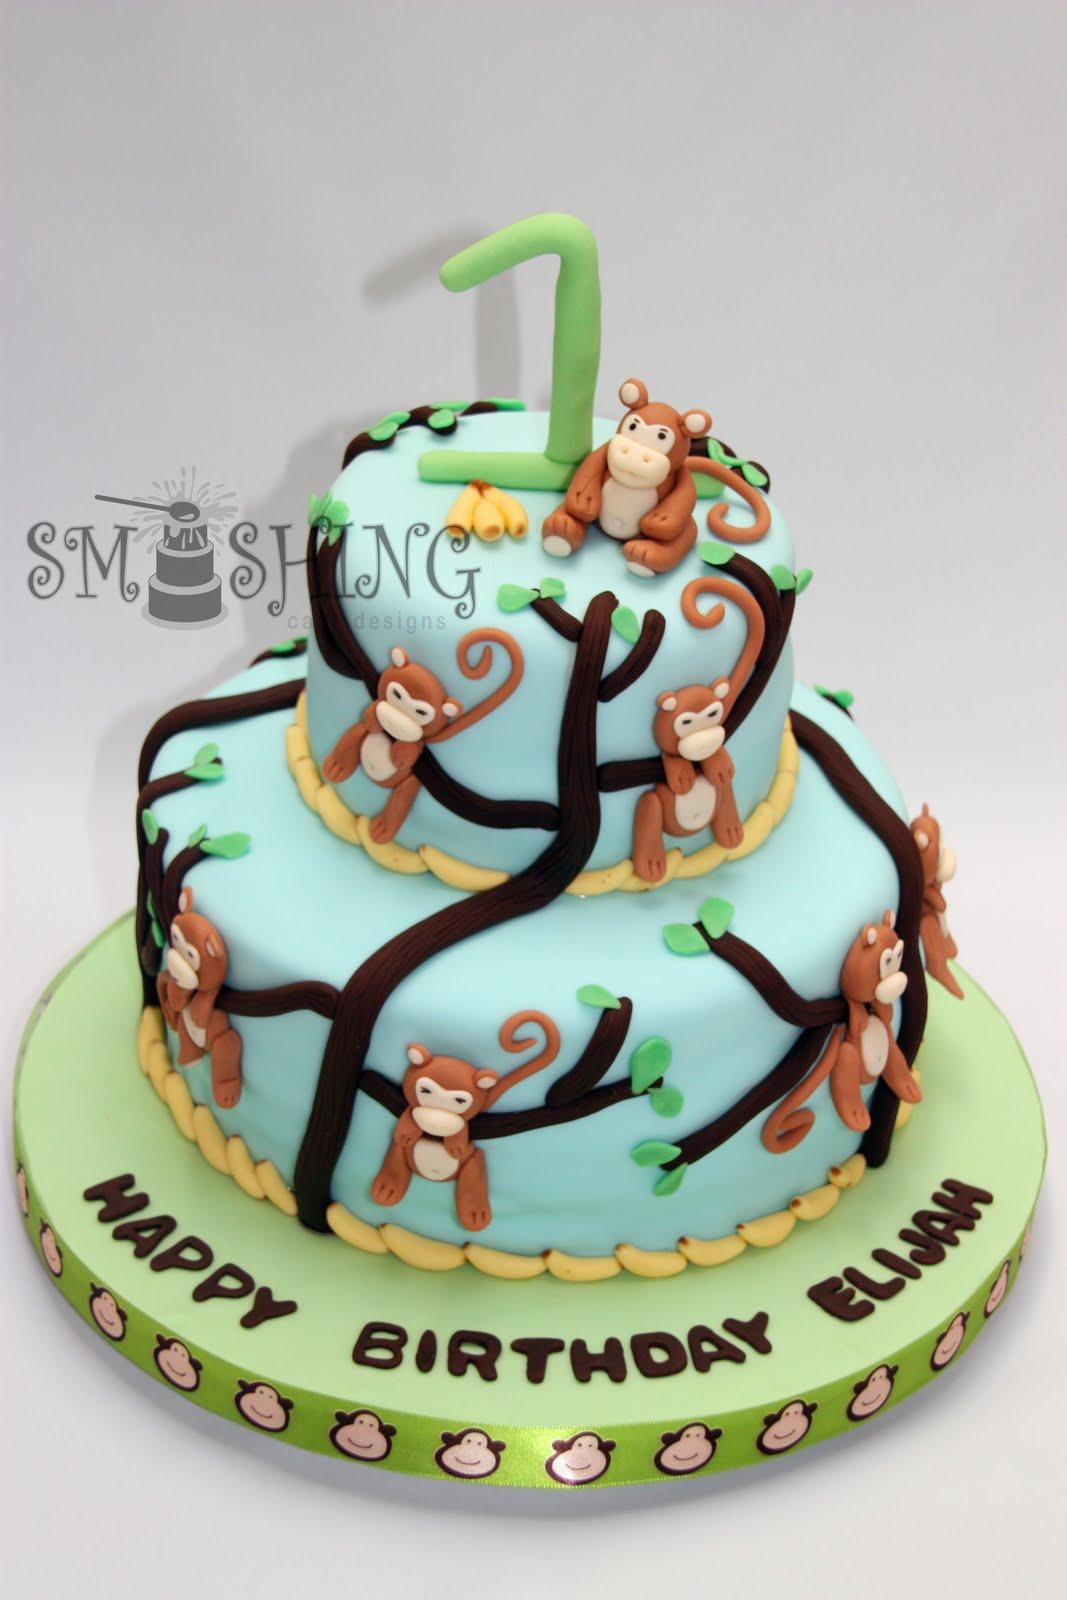 Smashing Cake Designs Monkey Business